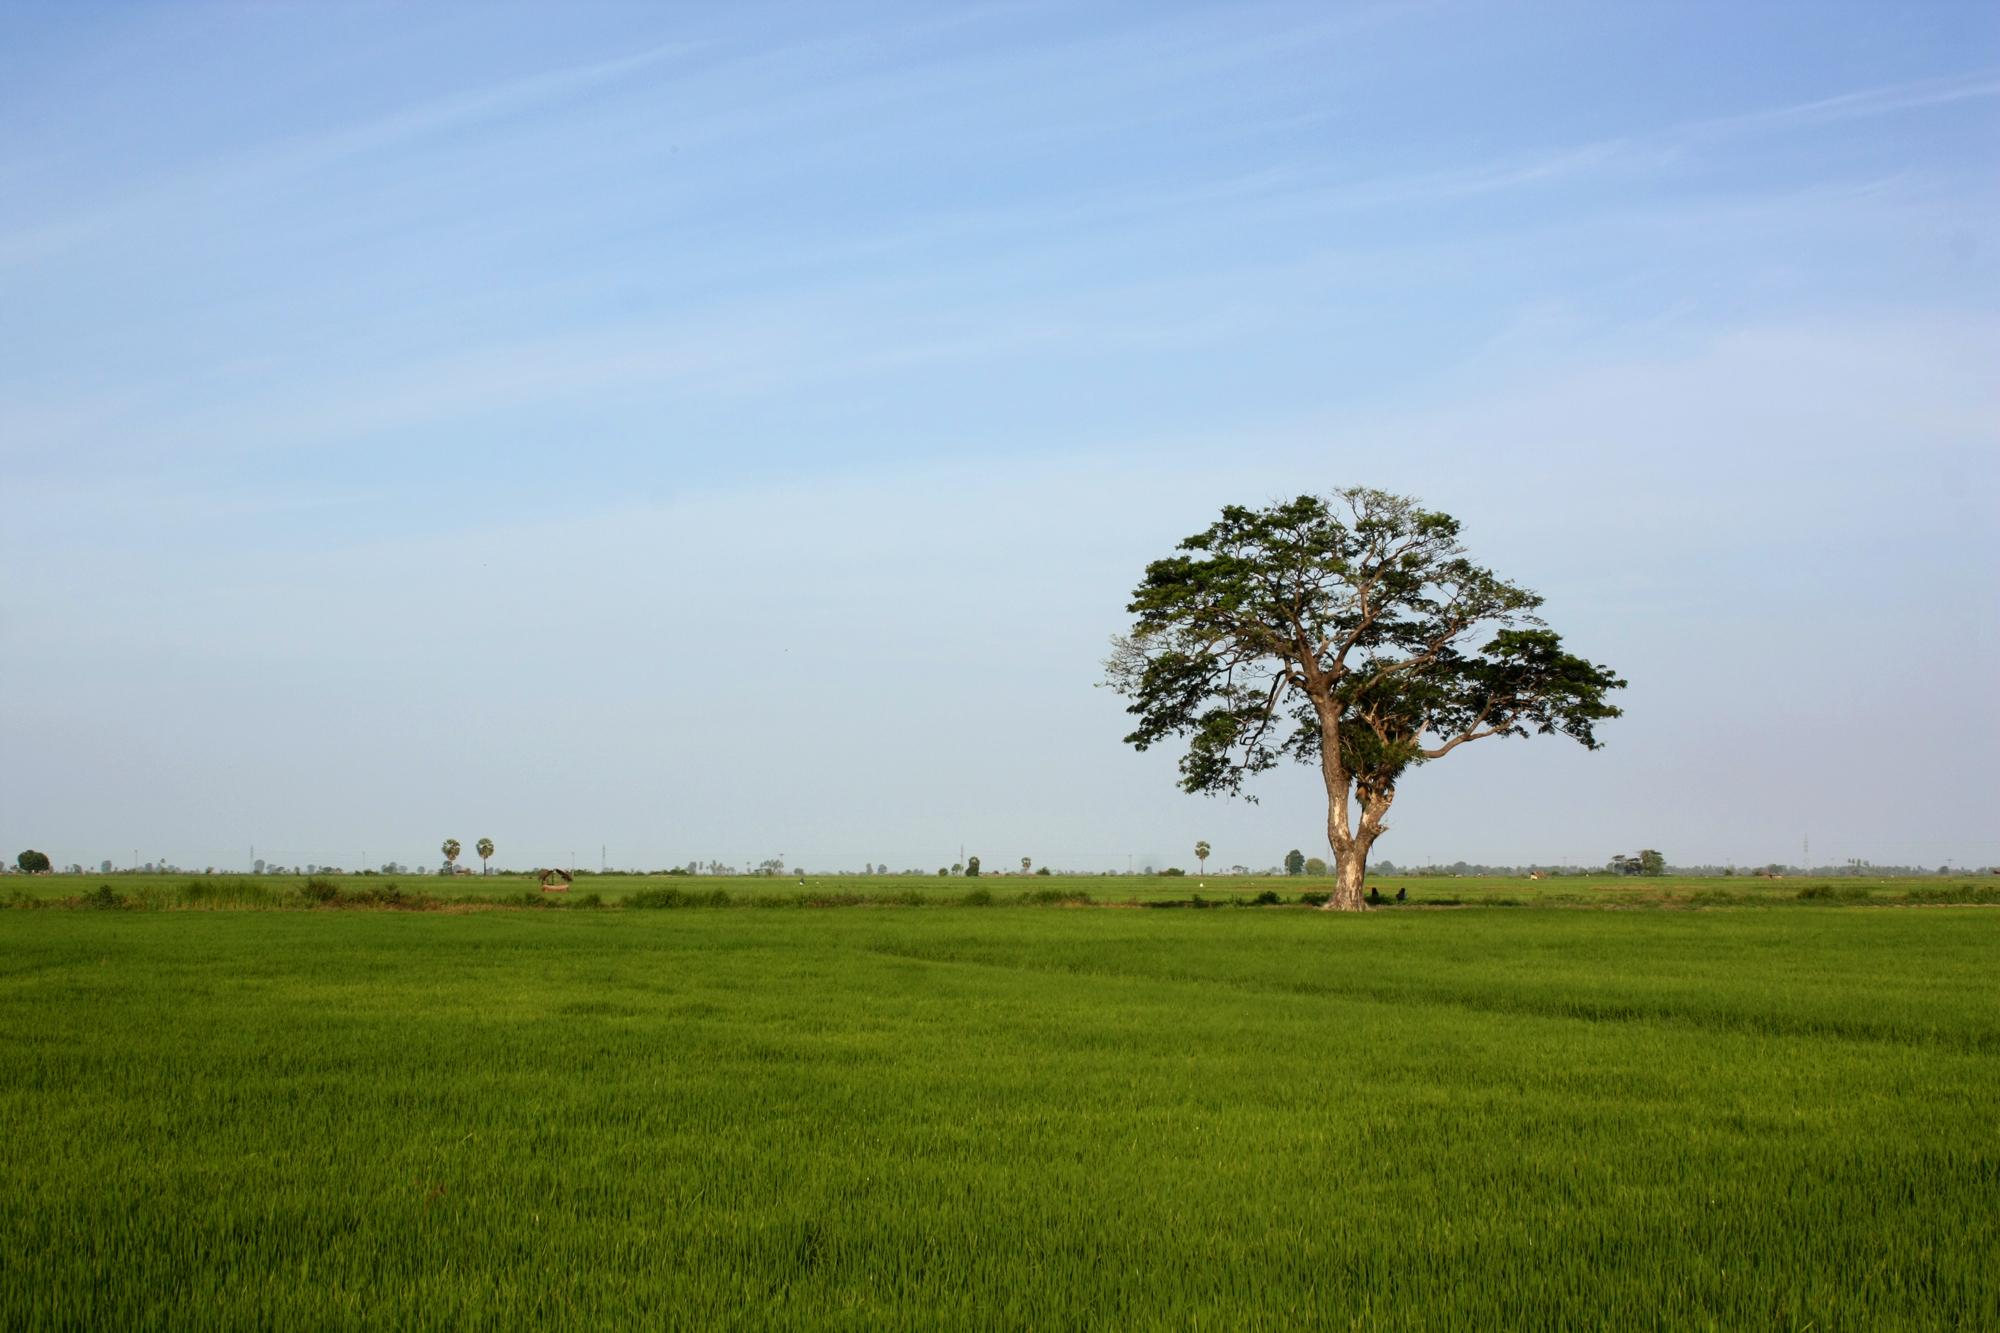 Ampara Sri Lanka  city images : amparai, Northern, Sri Lanka What happens in amparai right now!